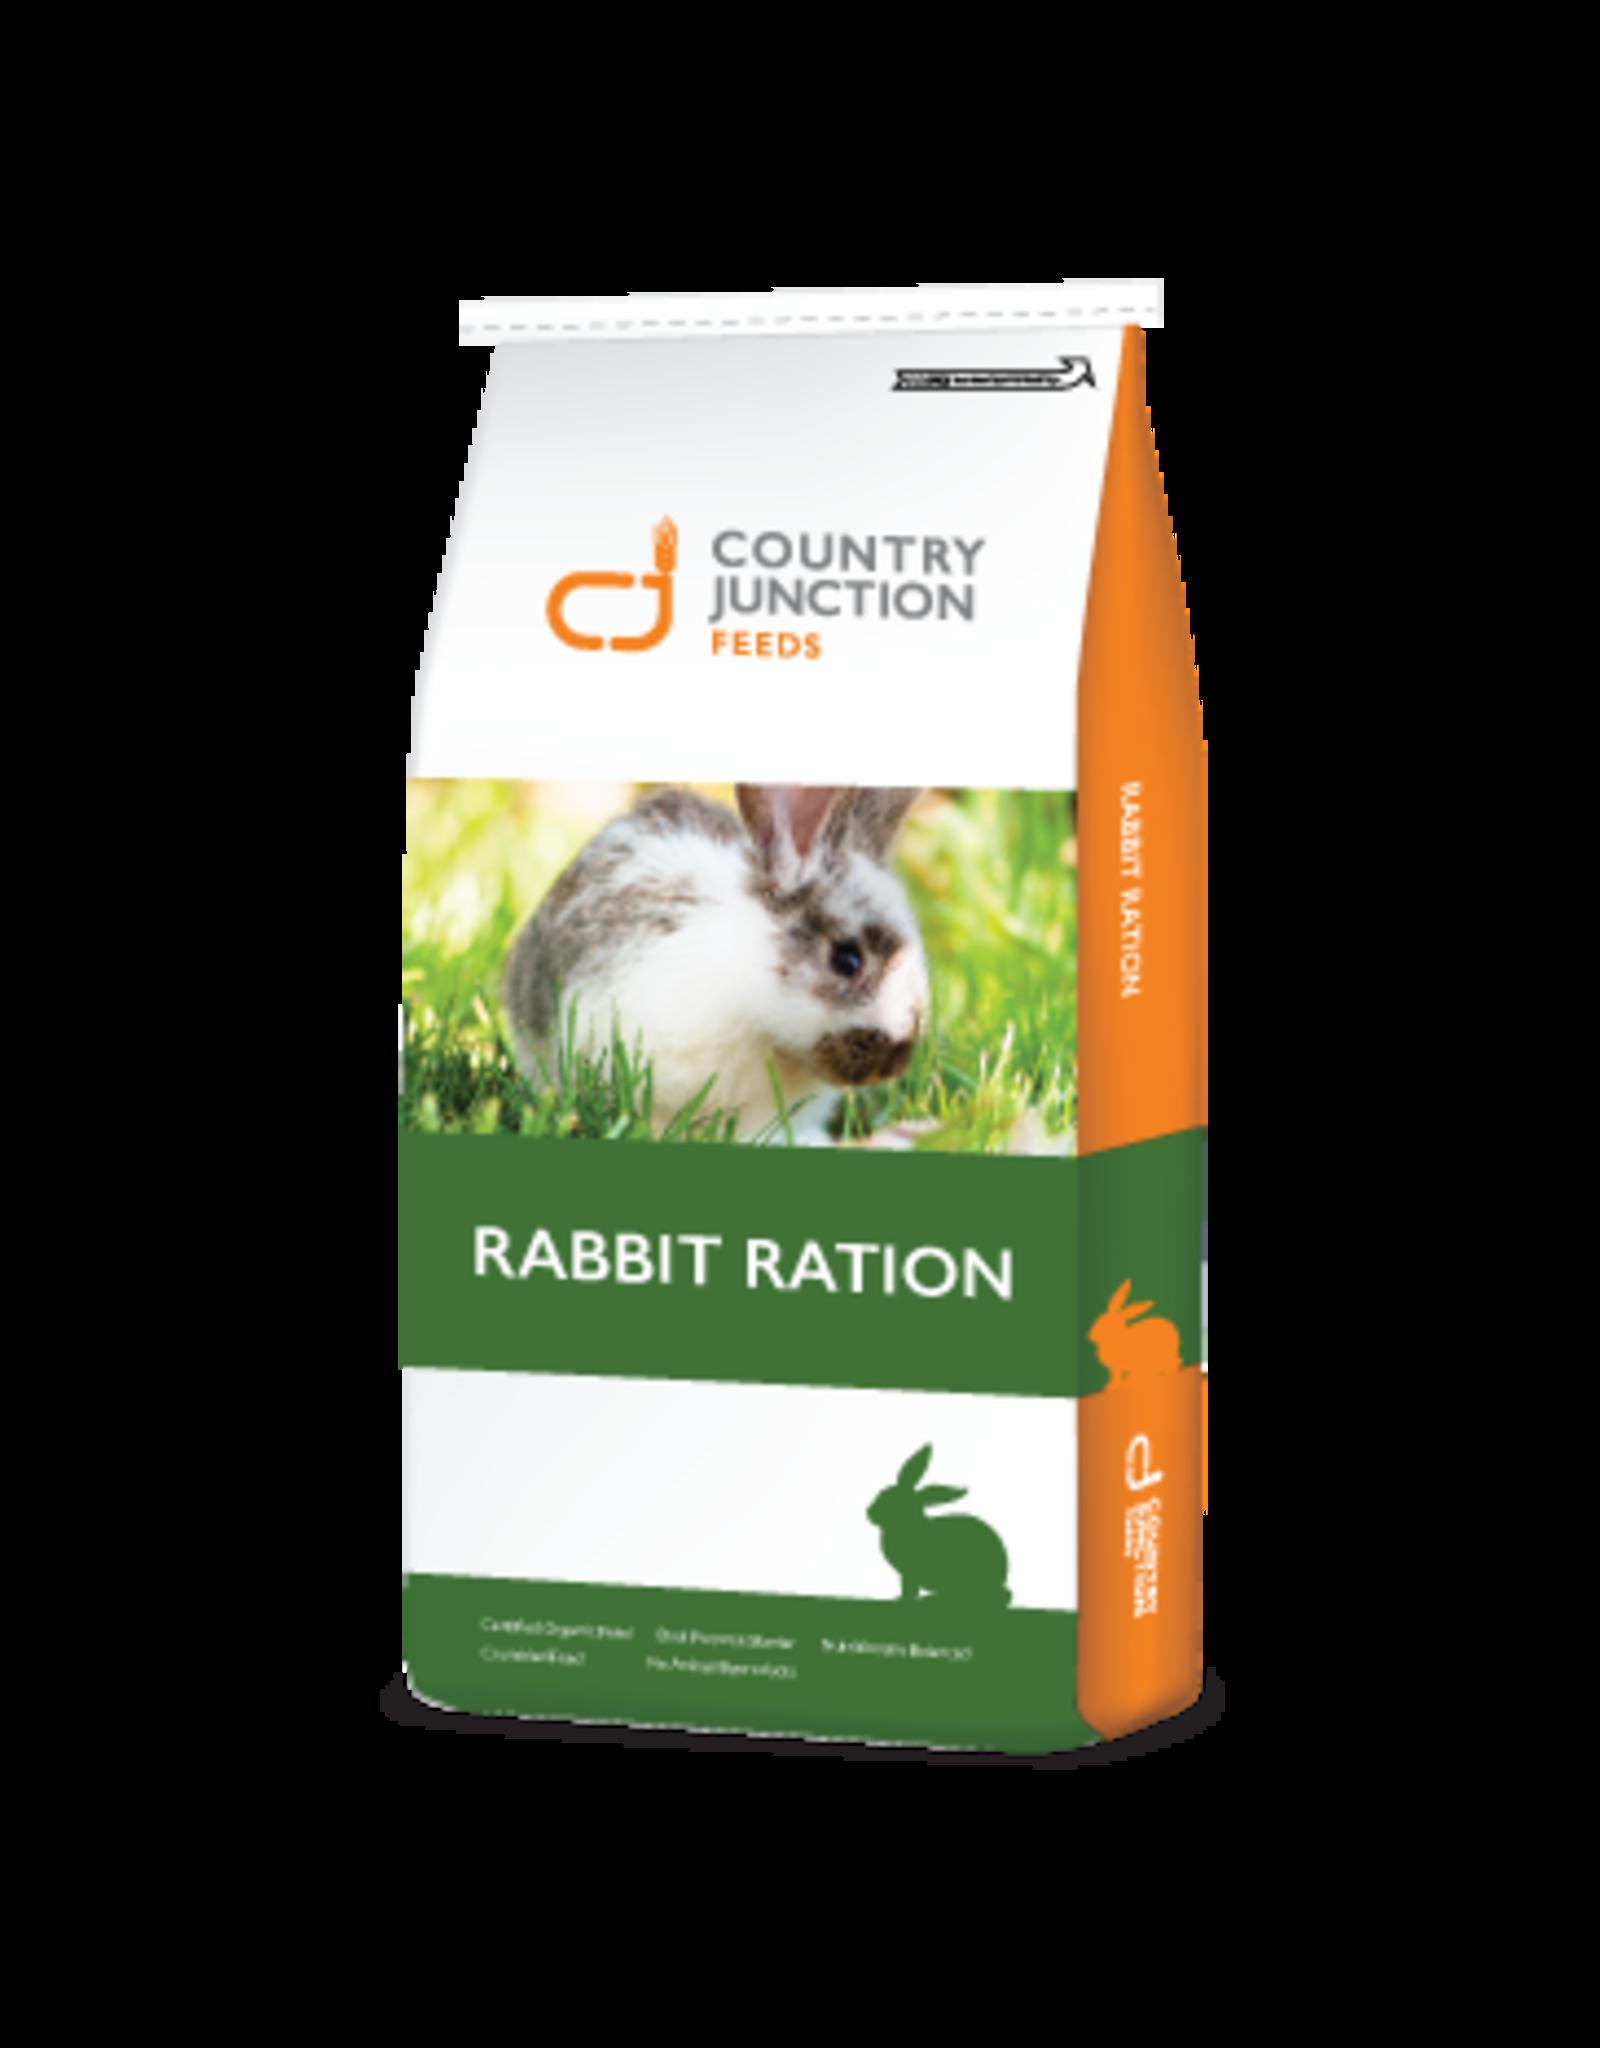 Country Junction Feeds Rabbit Ration - Pellet 20kg